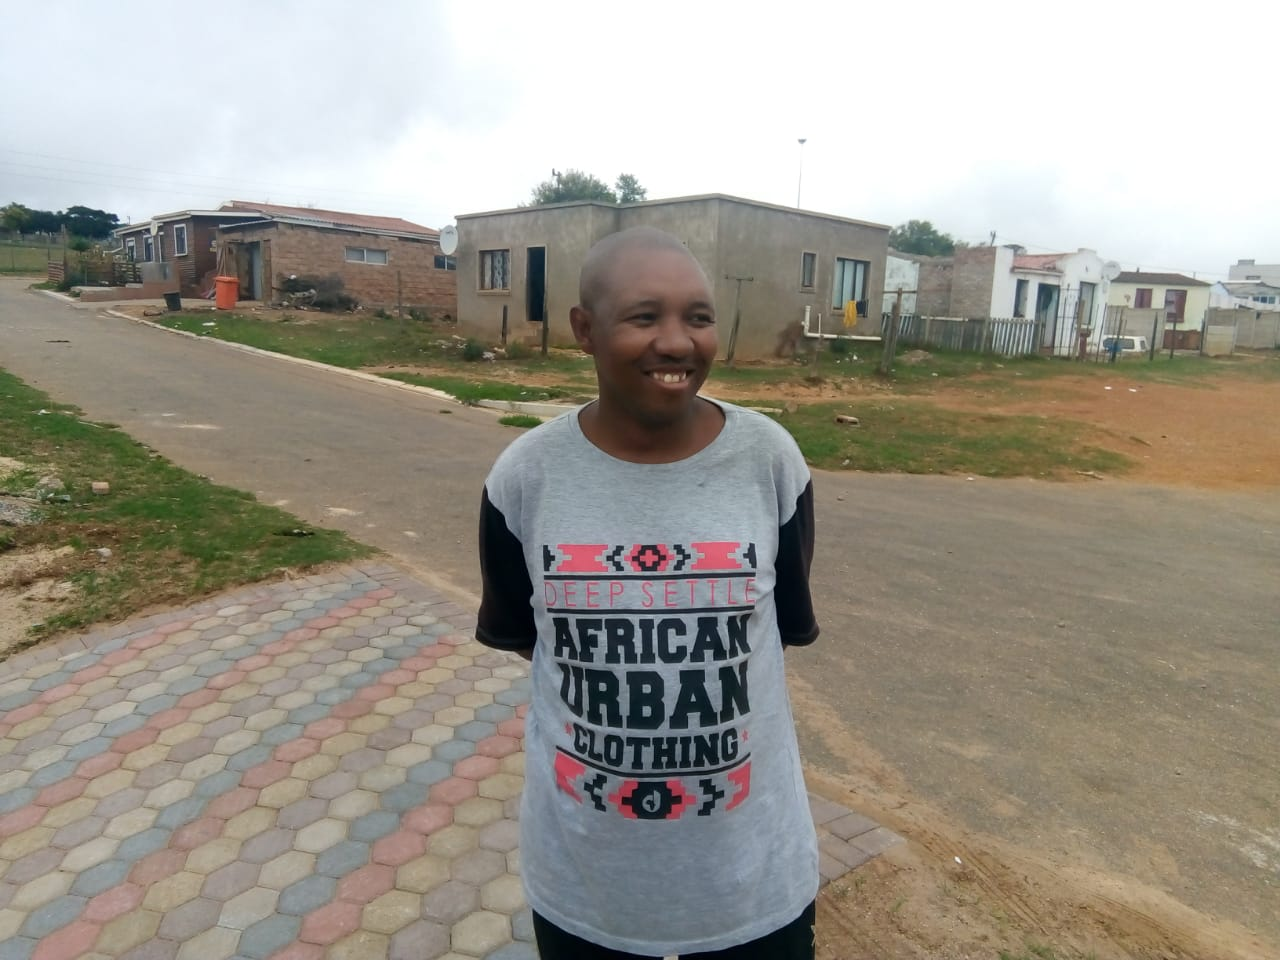 Unemployed for three years, Thulani Ngwenya believes entrepreneurship is the way to go